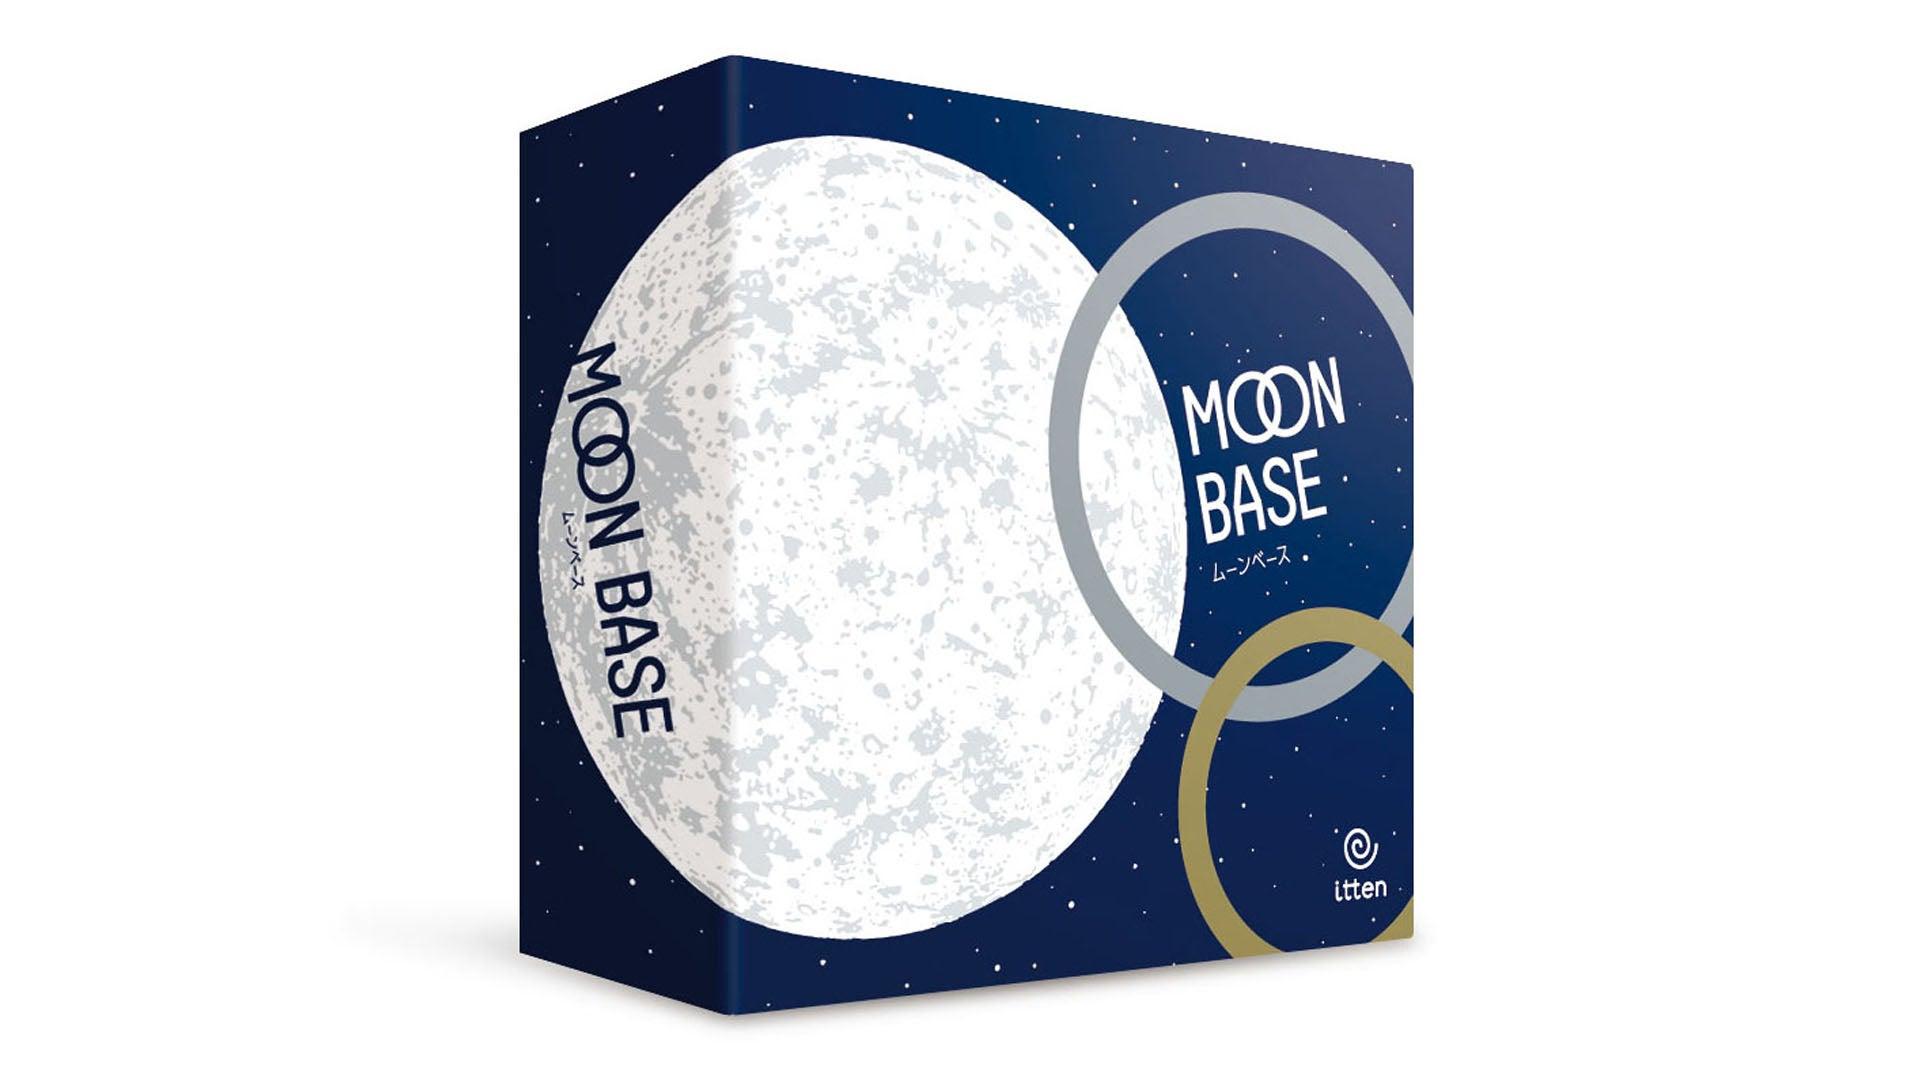 moon-base-board-game-box.jpg